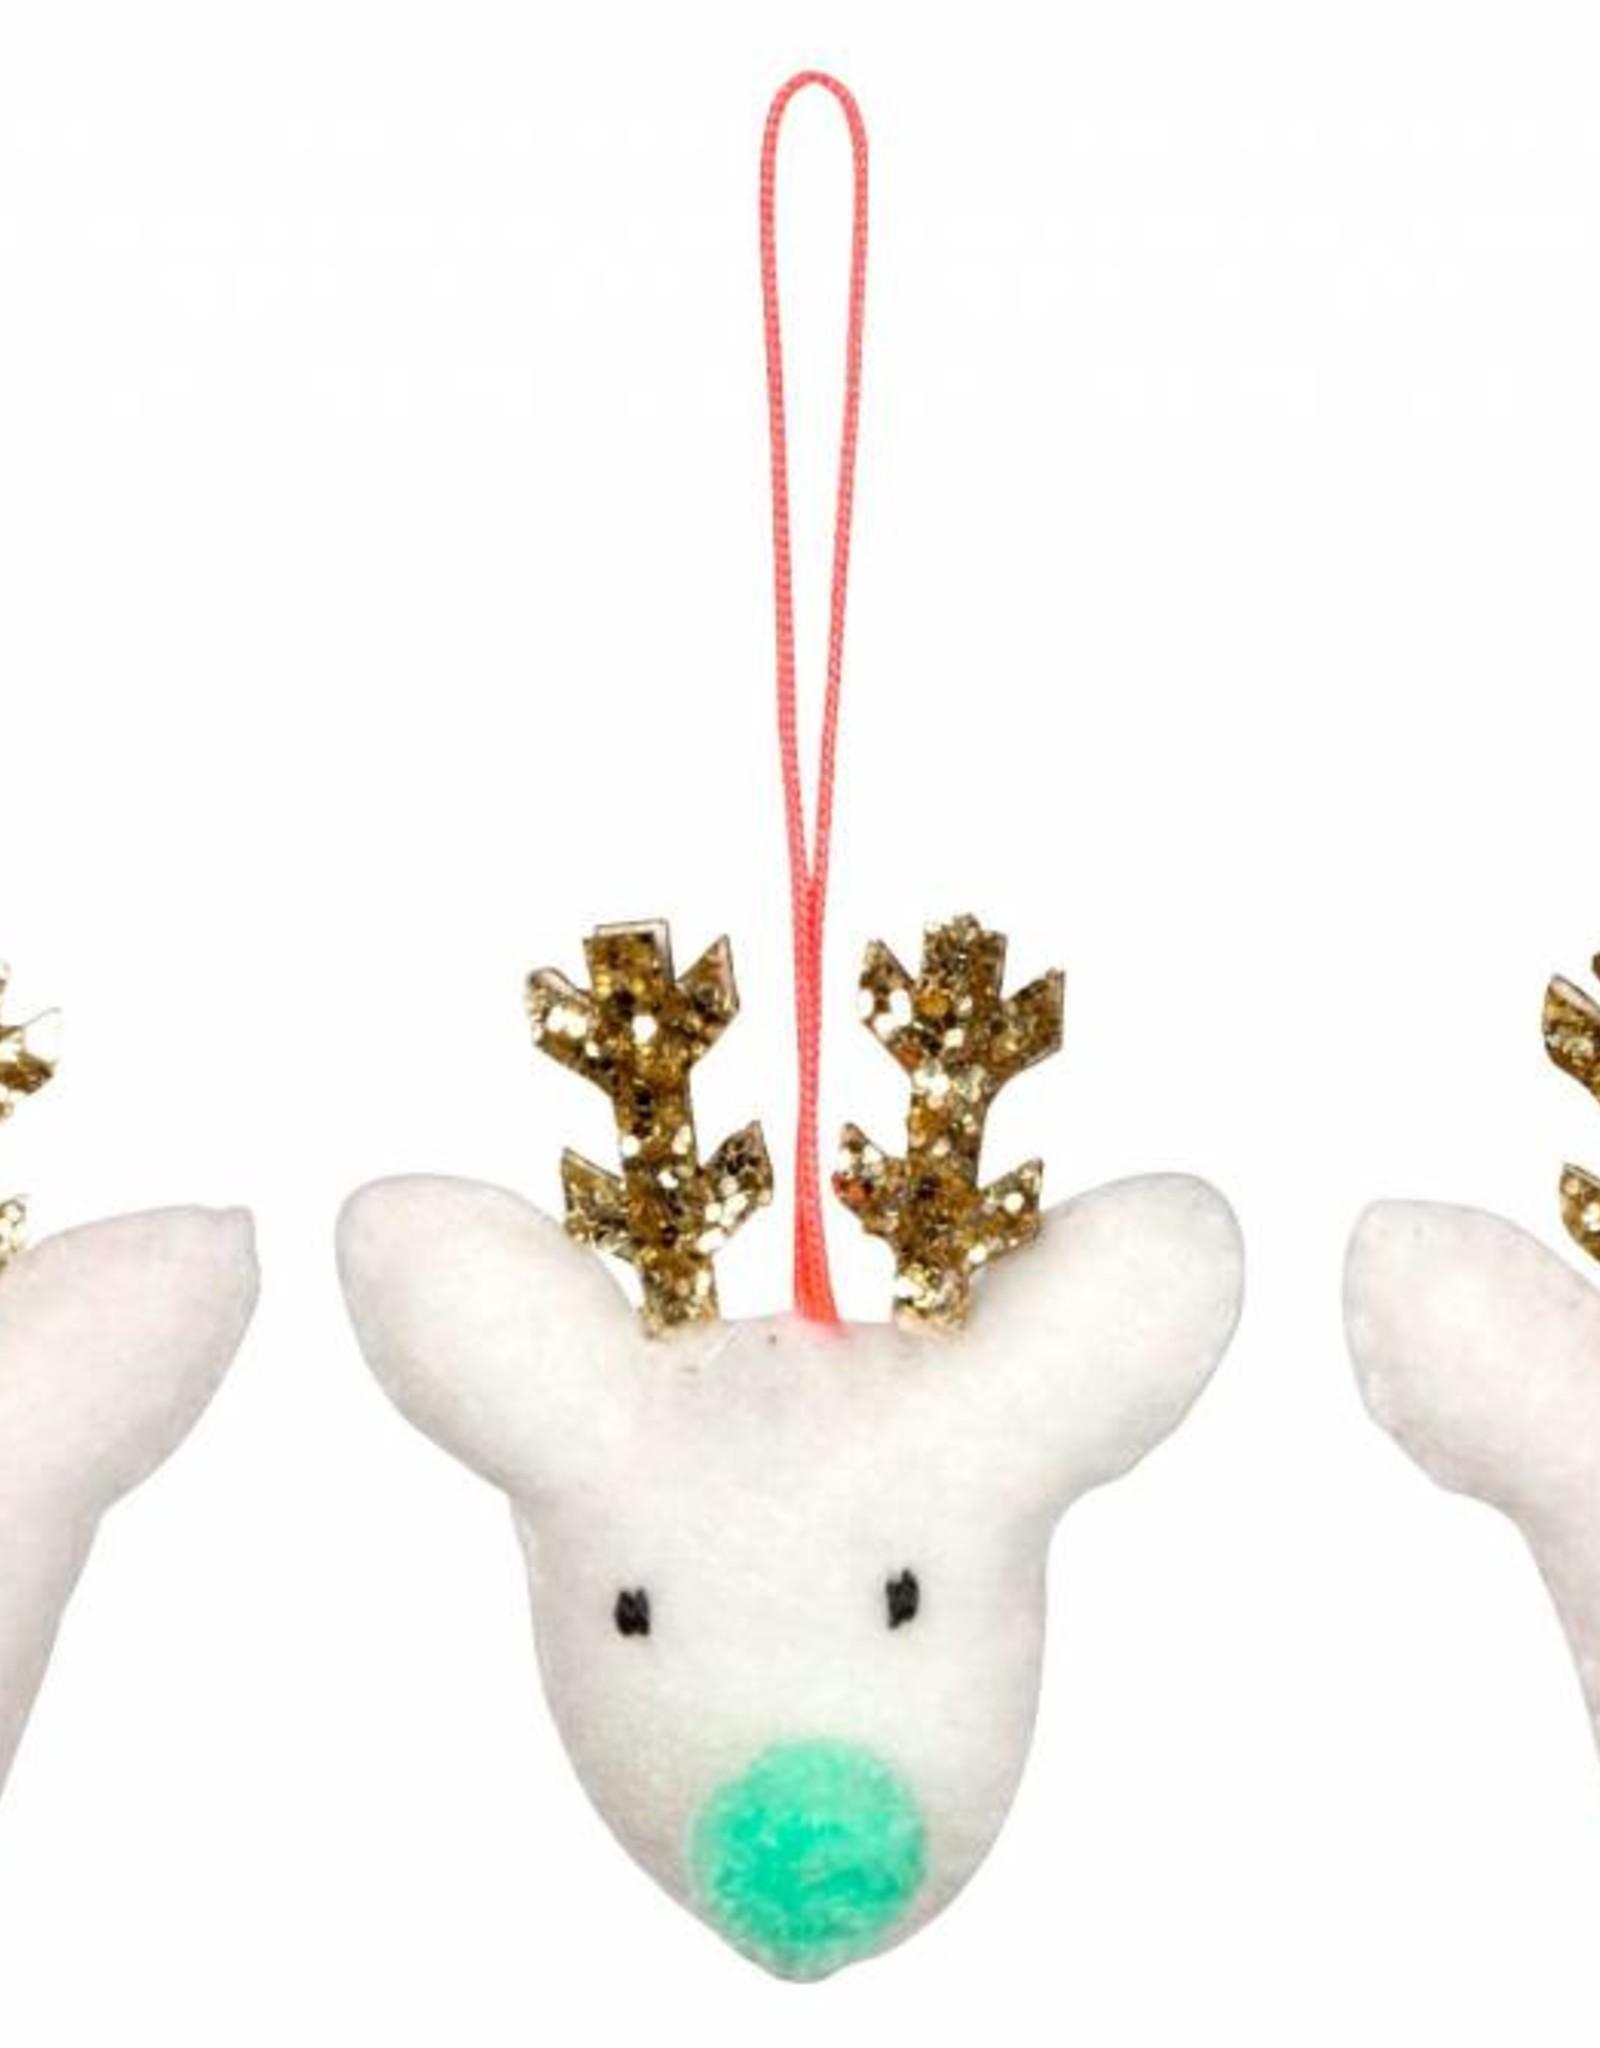 Meri Meri reindeer ornament set